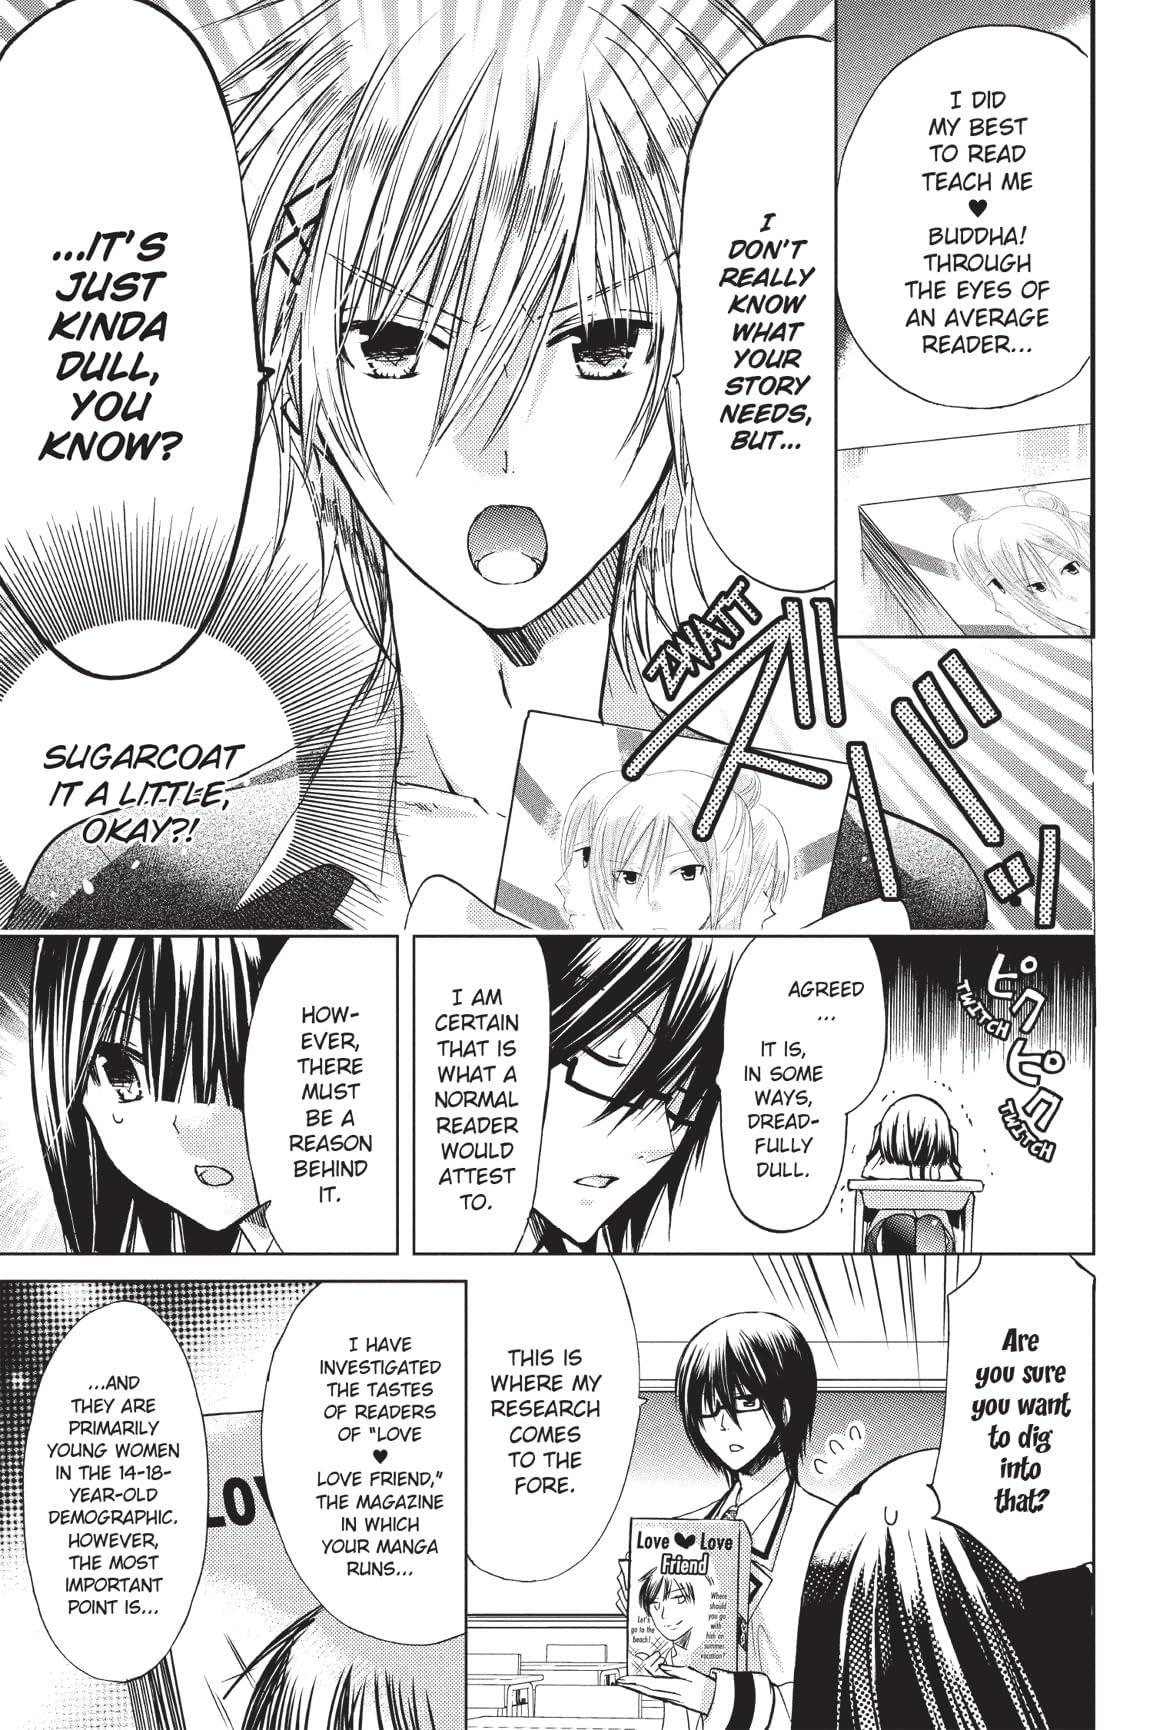 Manga Dogs Vol. 3